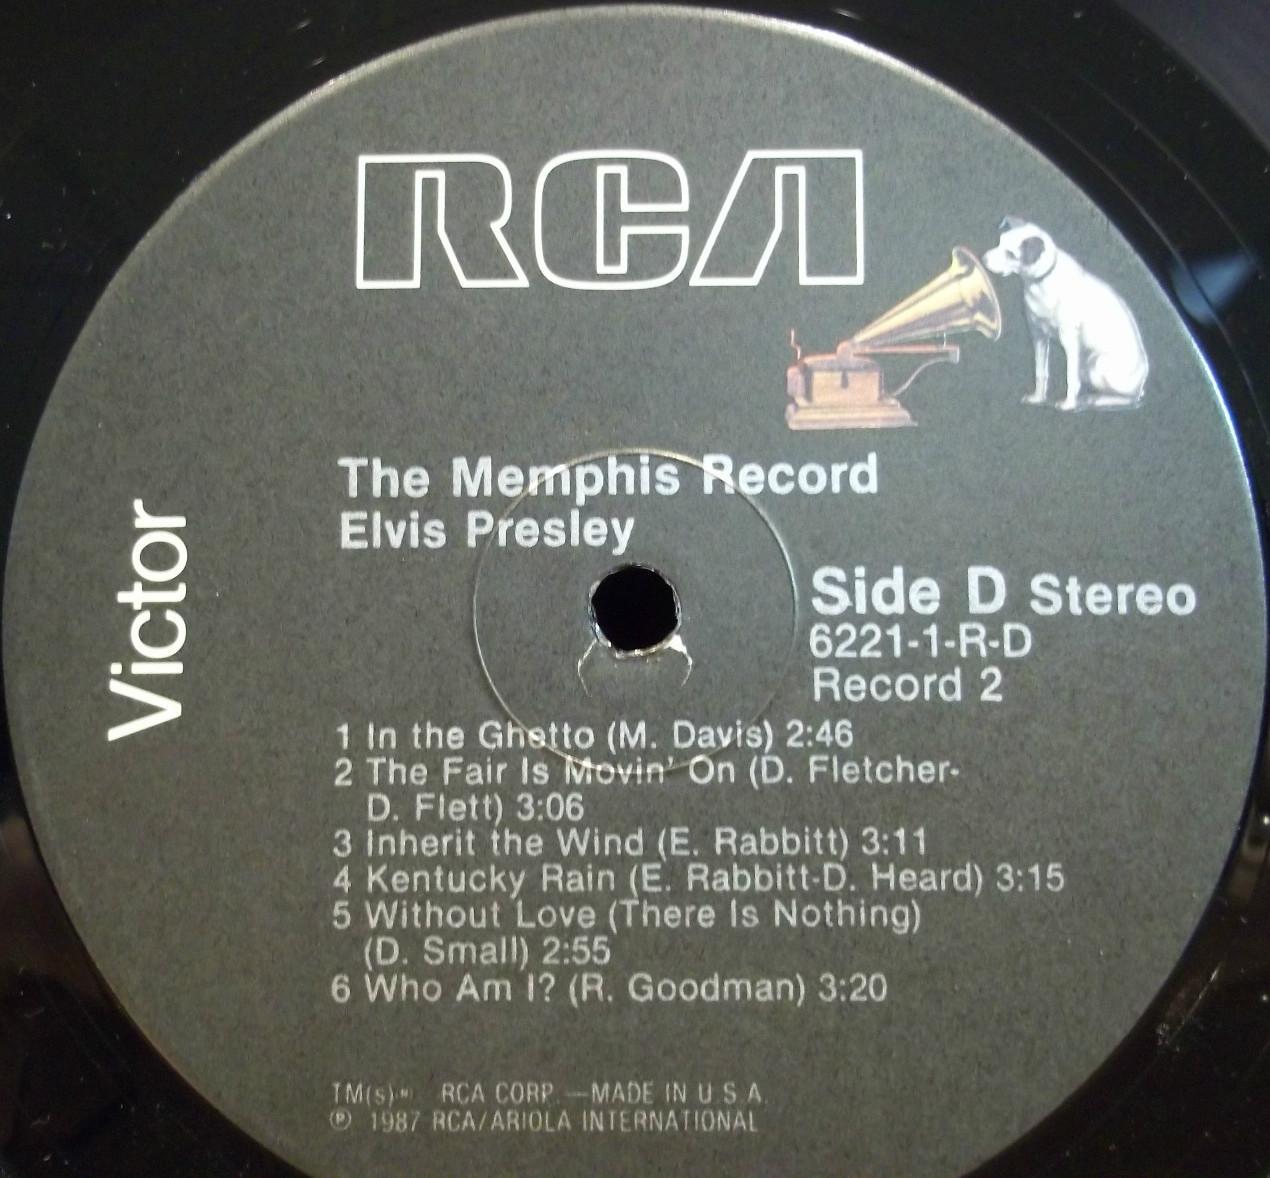 THE MEMPHIS RECORD 6221-1-r-dyrucf